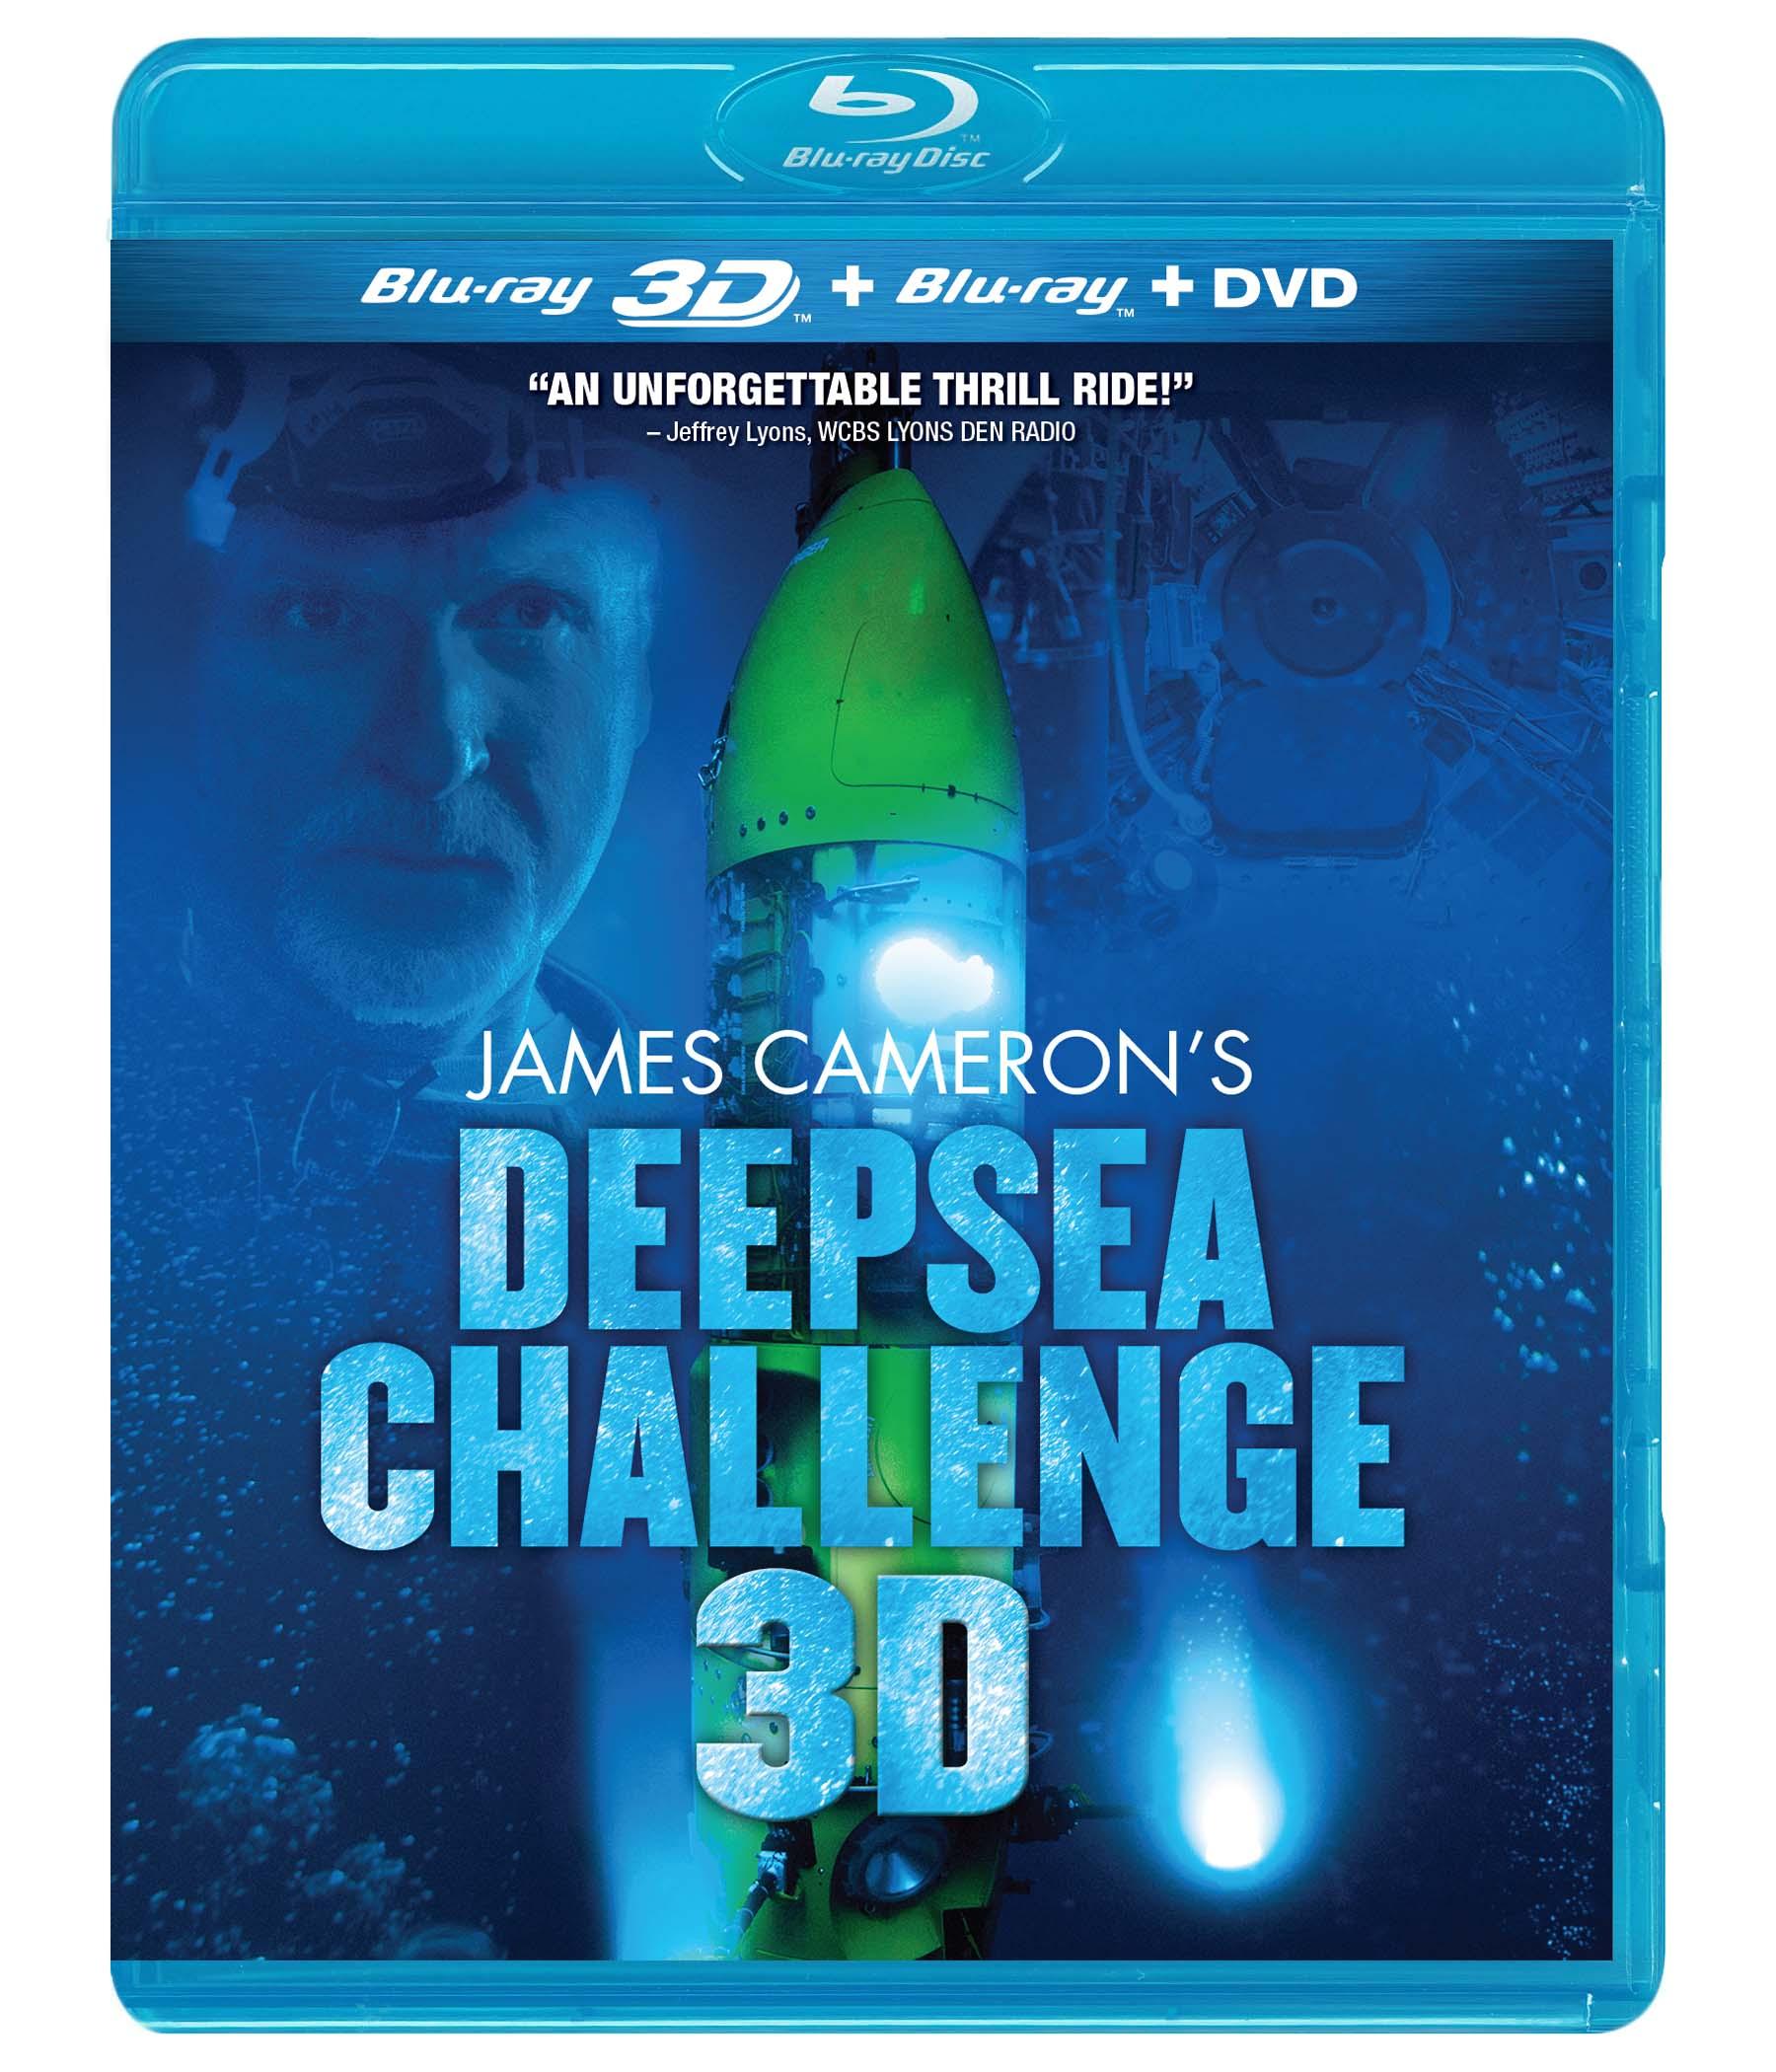 Deepsea Challenge 3D Blu-ray Review